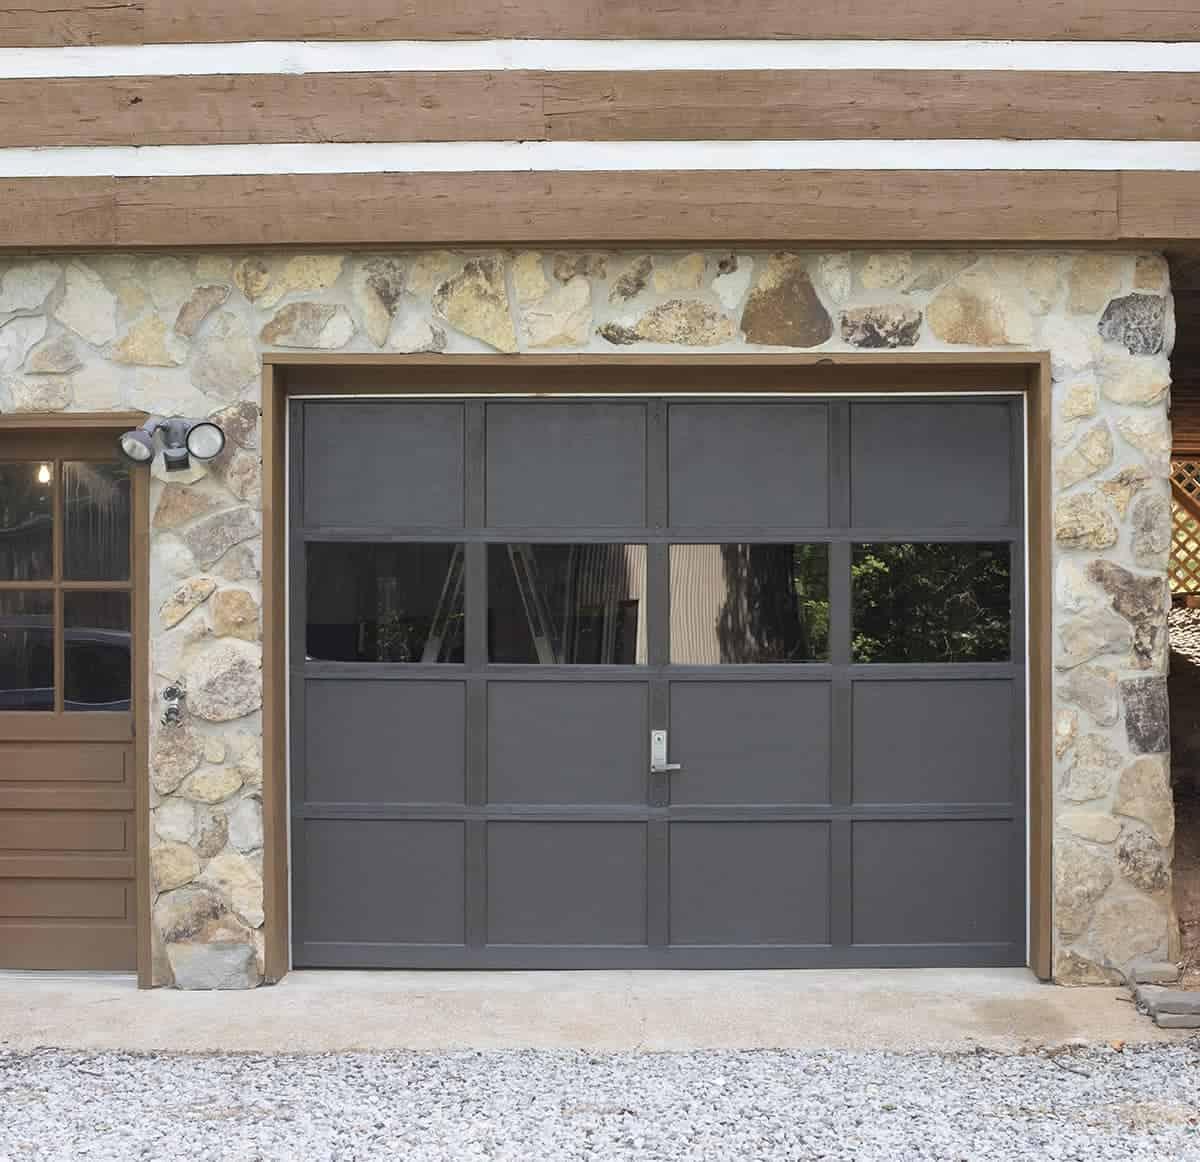 Black painted wooden garage door against stone exterior.